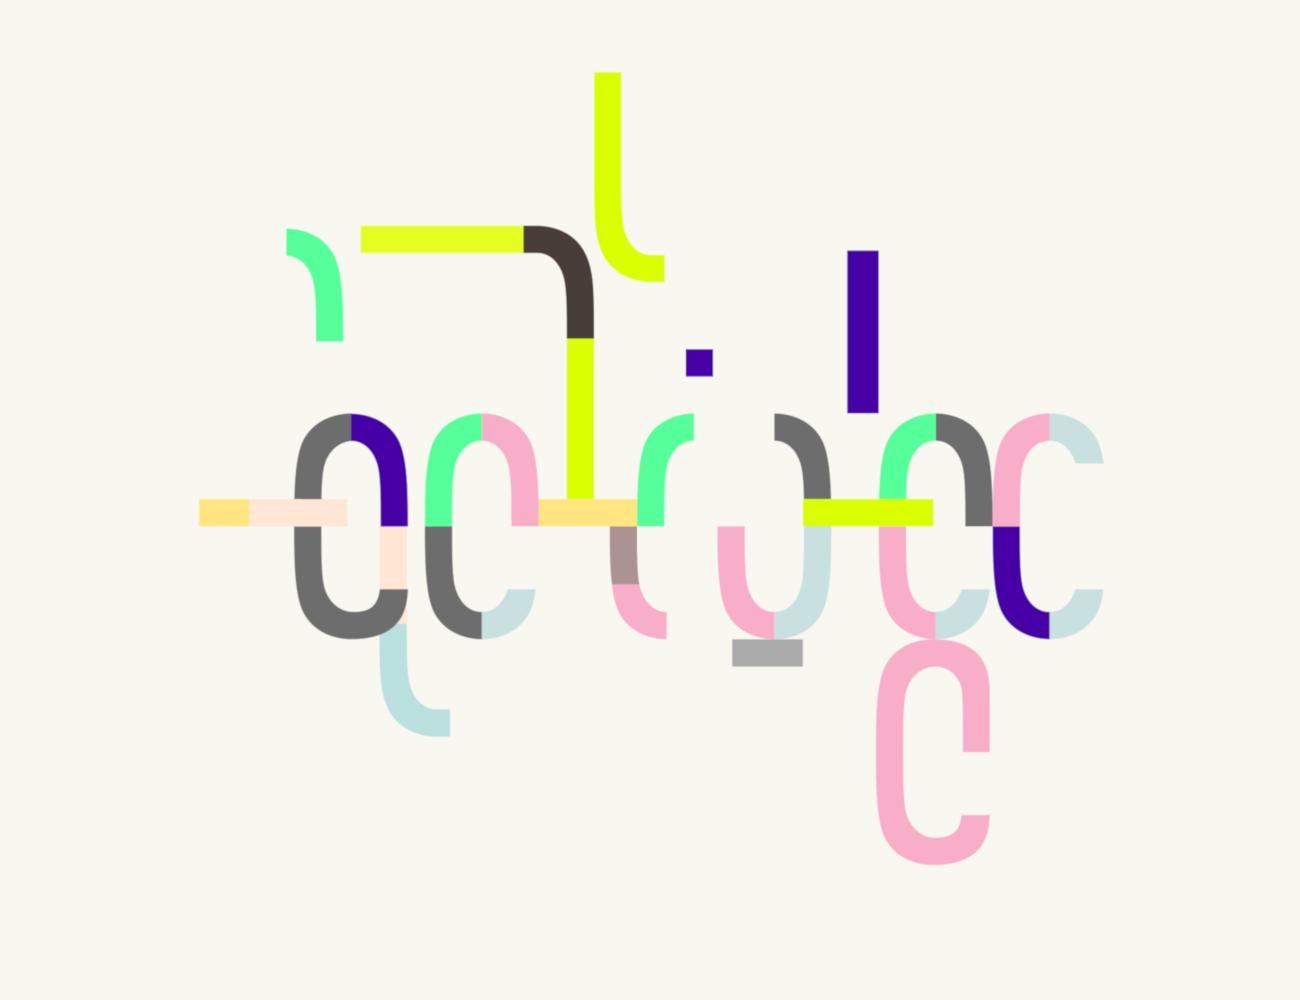 platformer_zdesign_smaller_rectangle_1300x1000.png